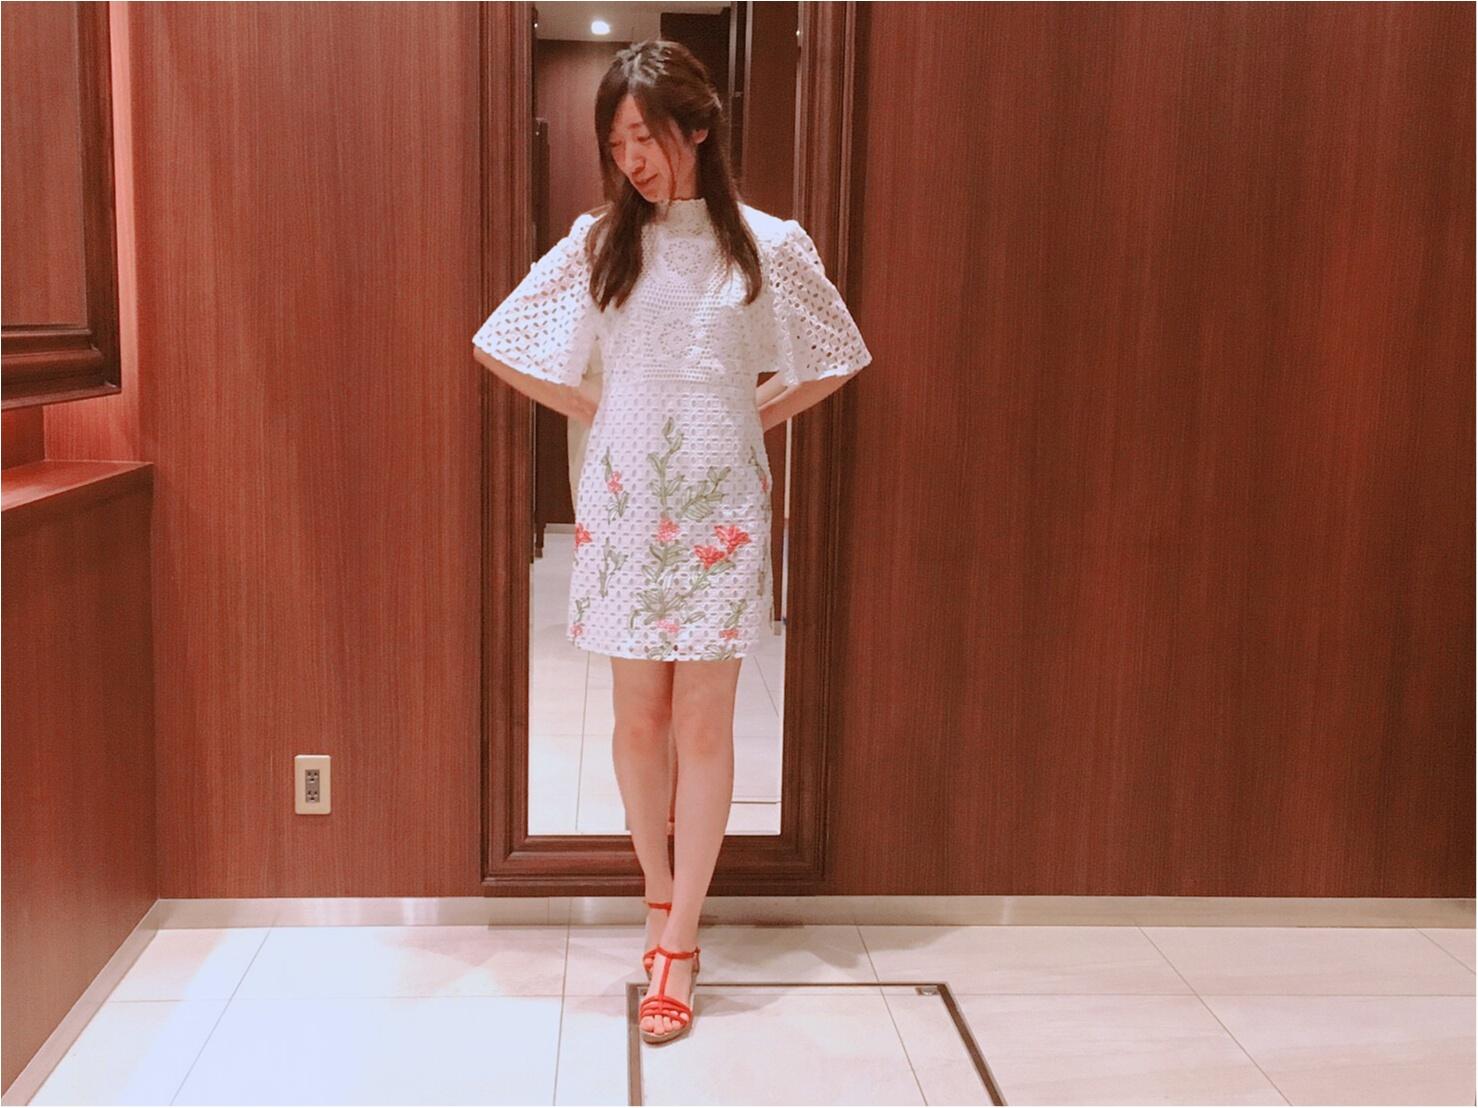 【ZARA】刺繍入りレースワンピース(¥7,990)がクラシカルで可愛い♡_3